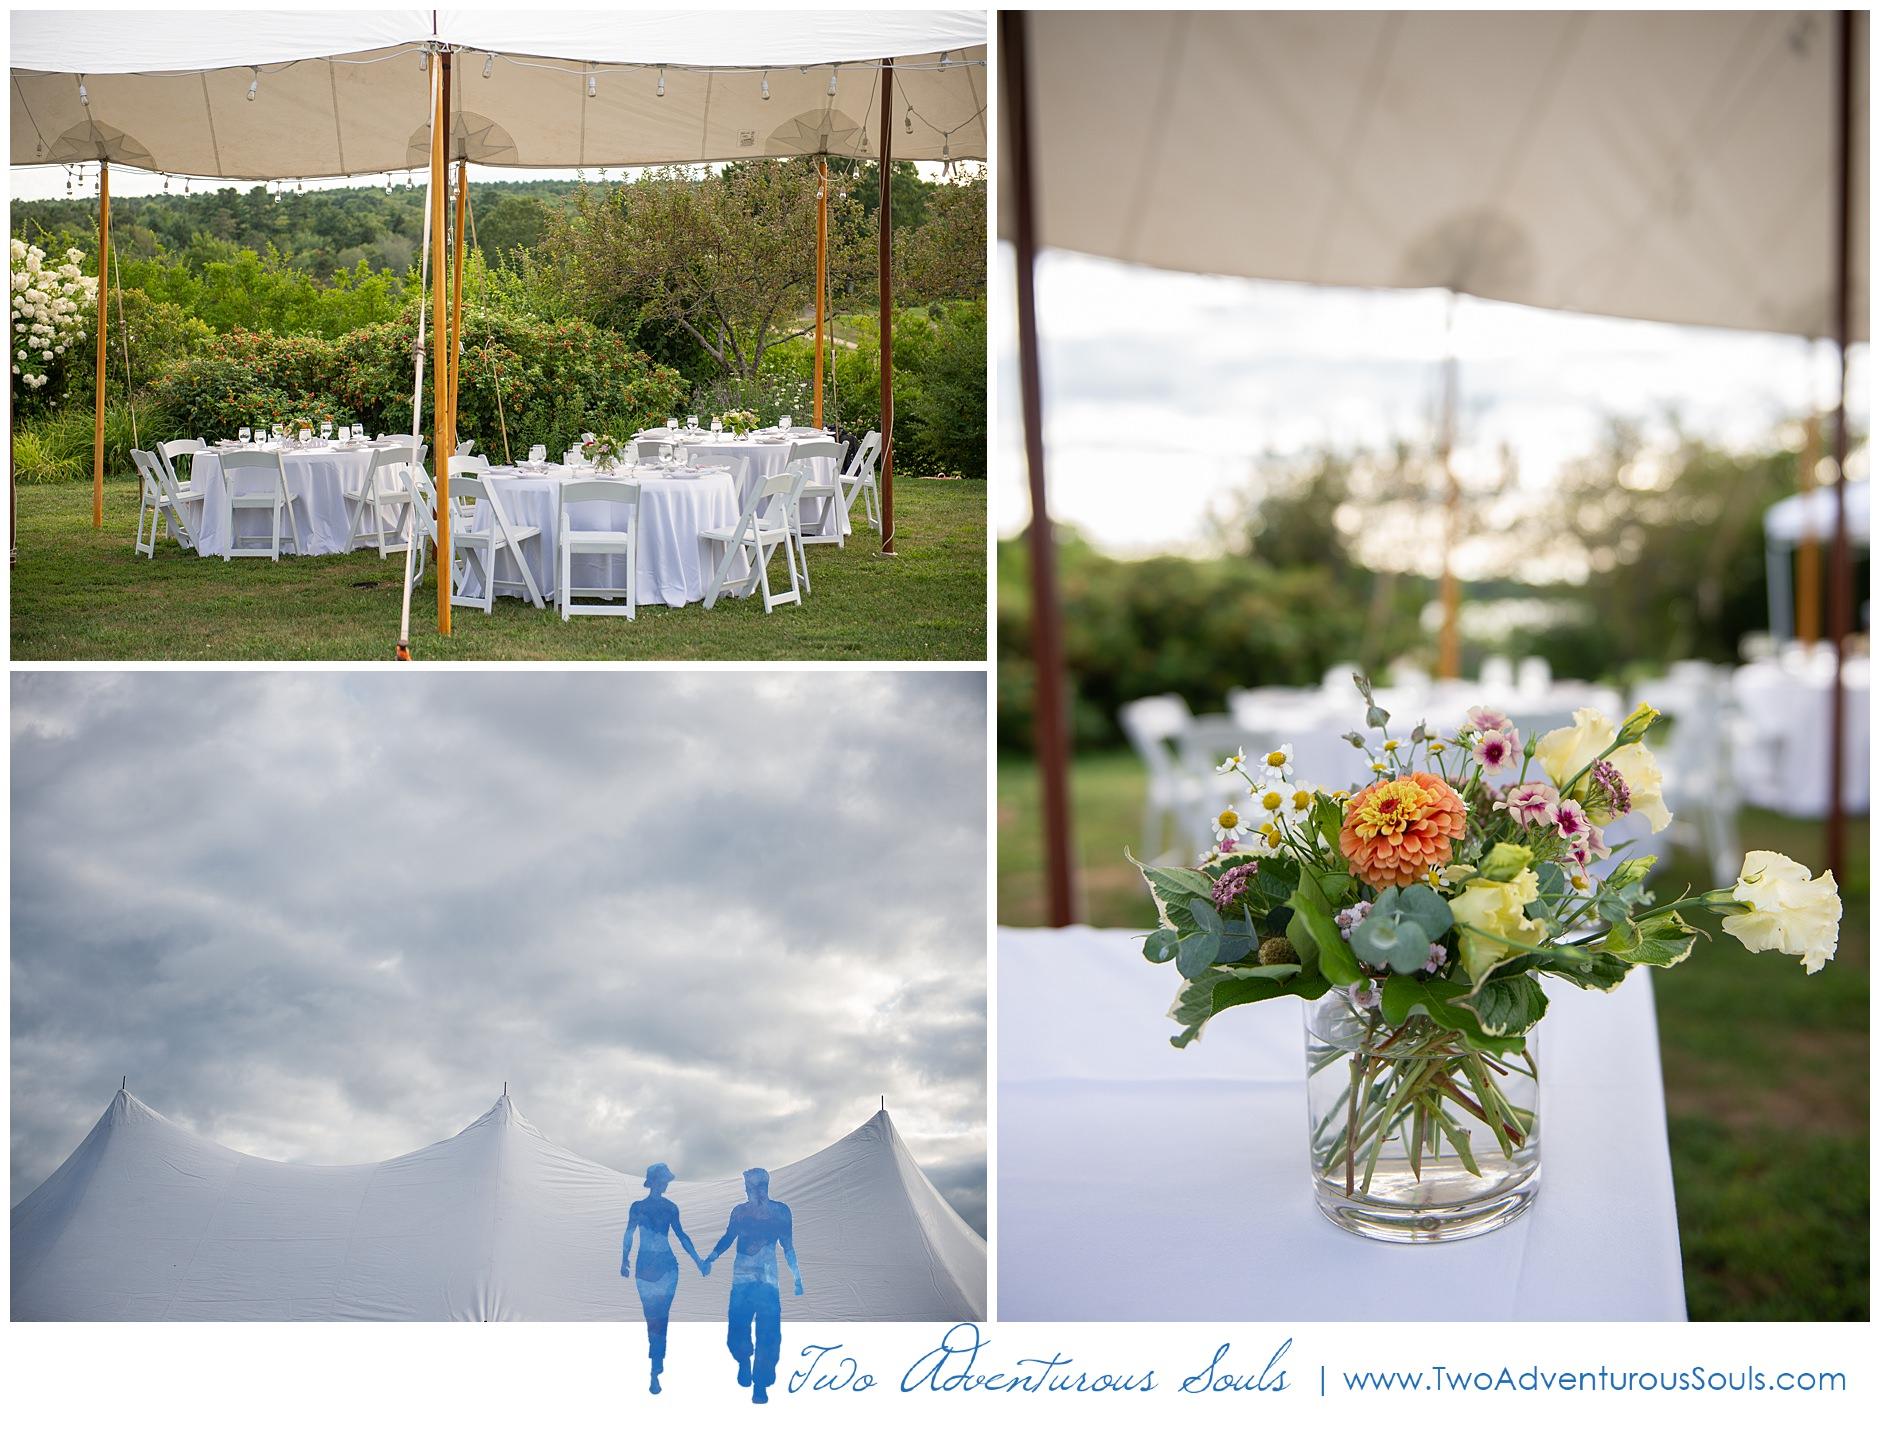 Chebeague Island Inn Wedding Photograpehrs, Maine Wedding Photographers, Two Adventurous Souls-082419_0013.jpg